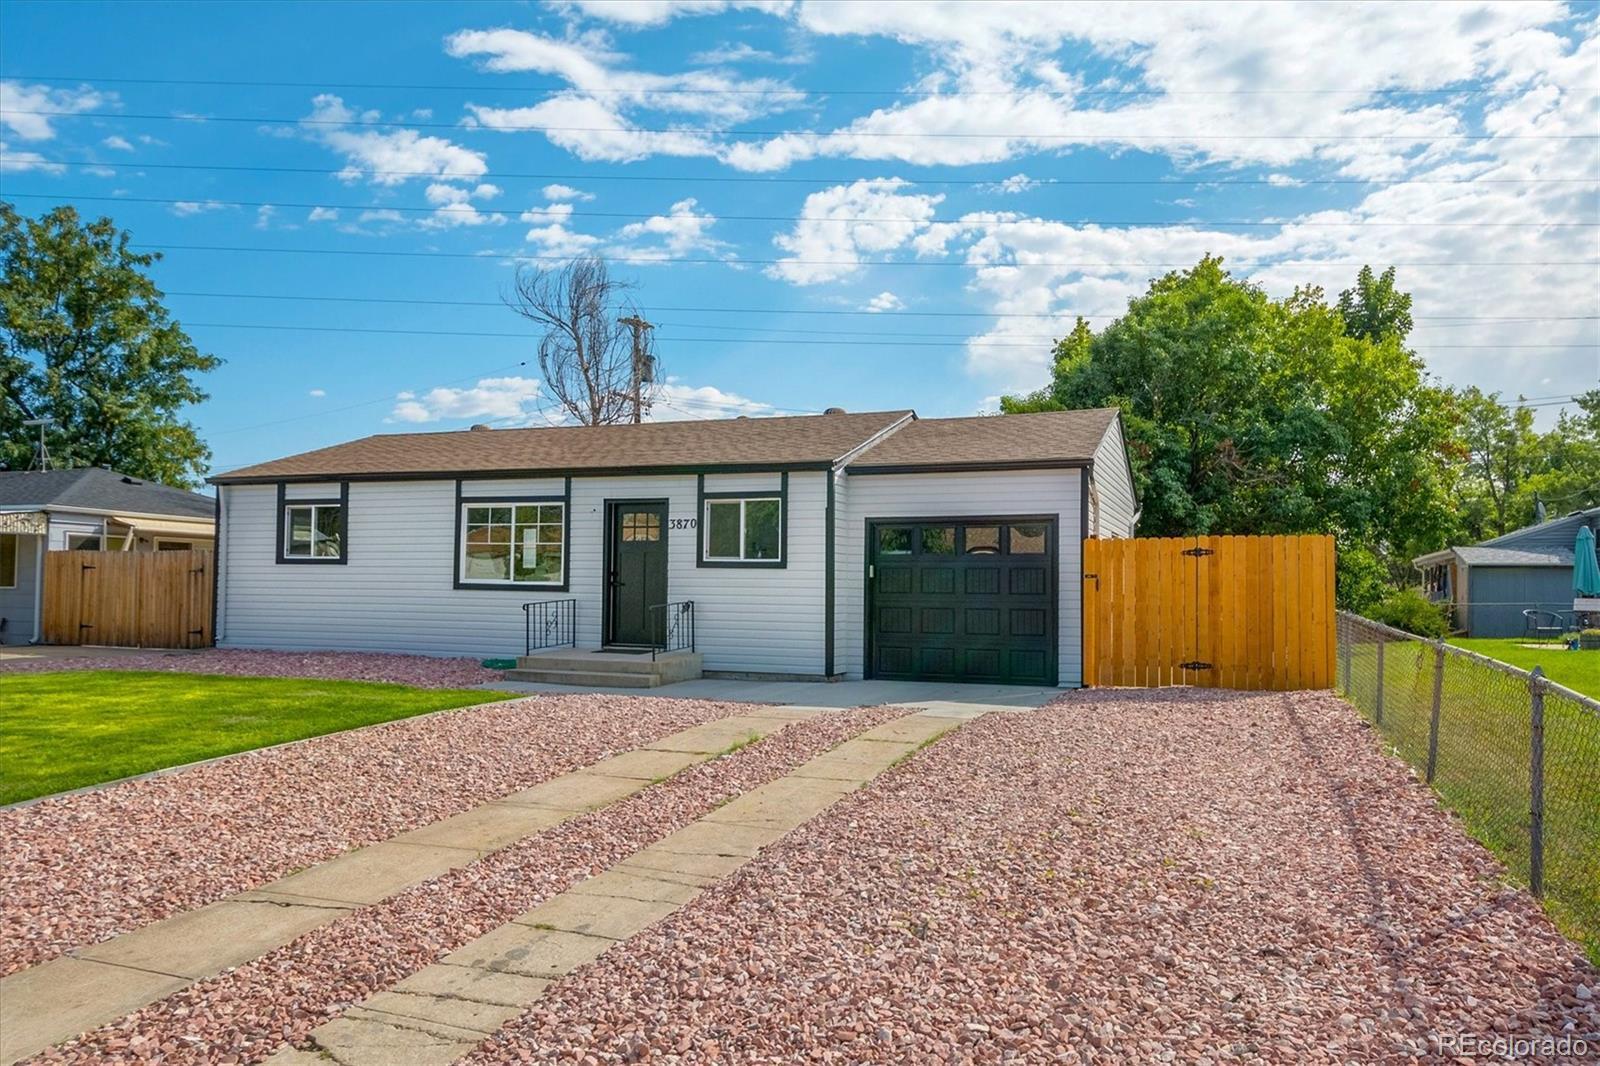 3870 Newman, Wheat Ridge, CO